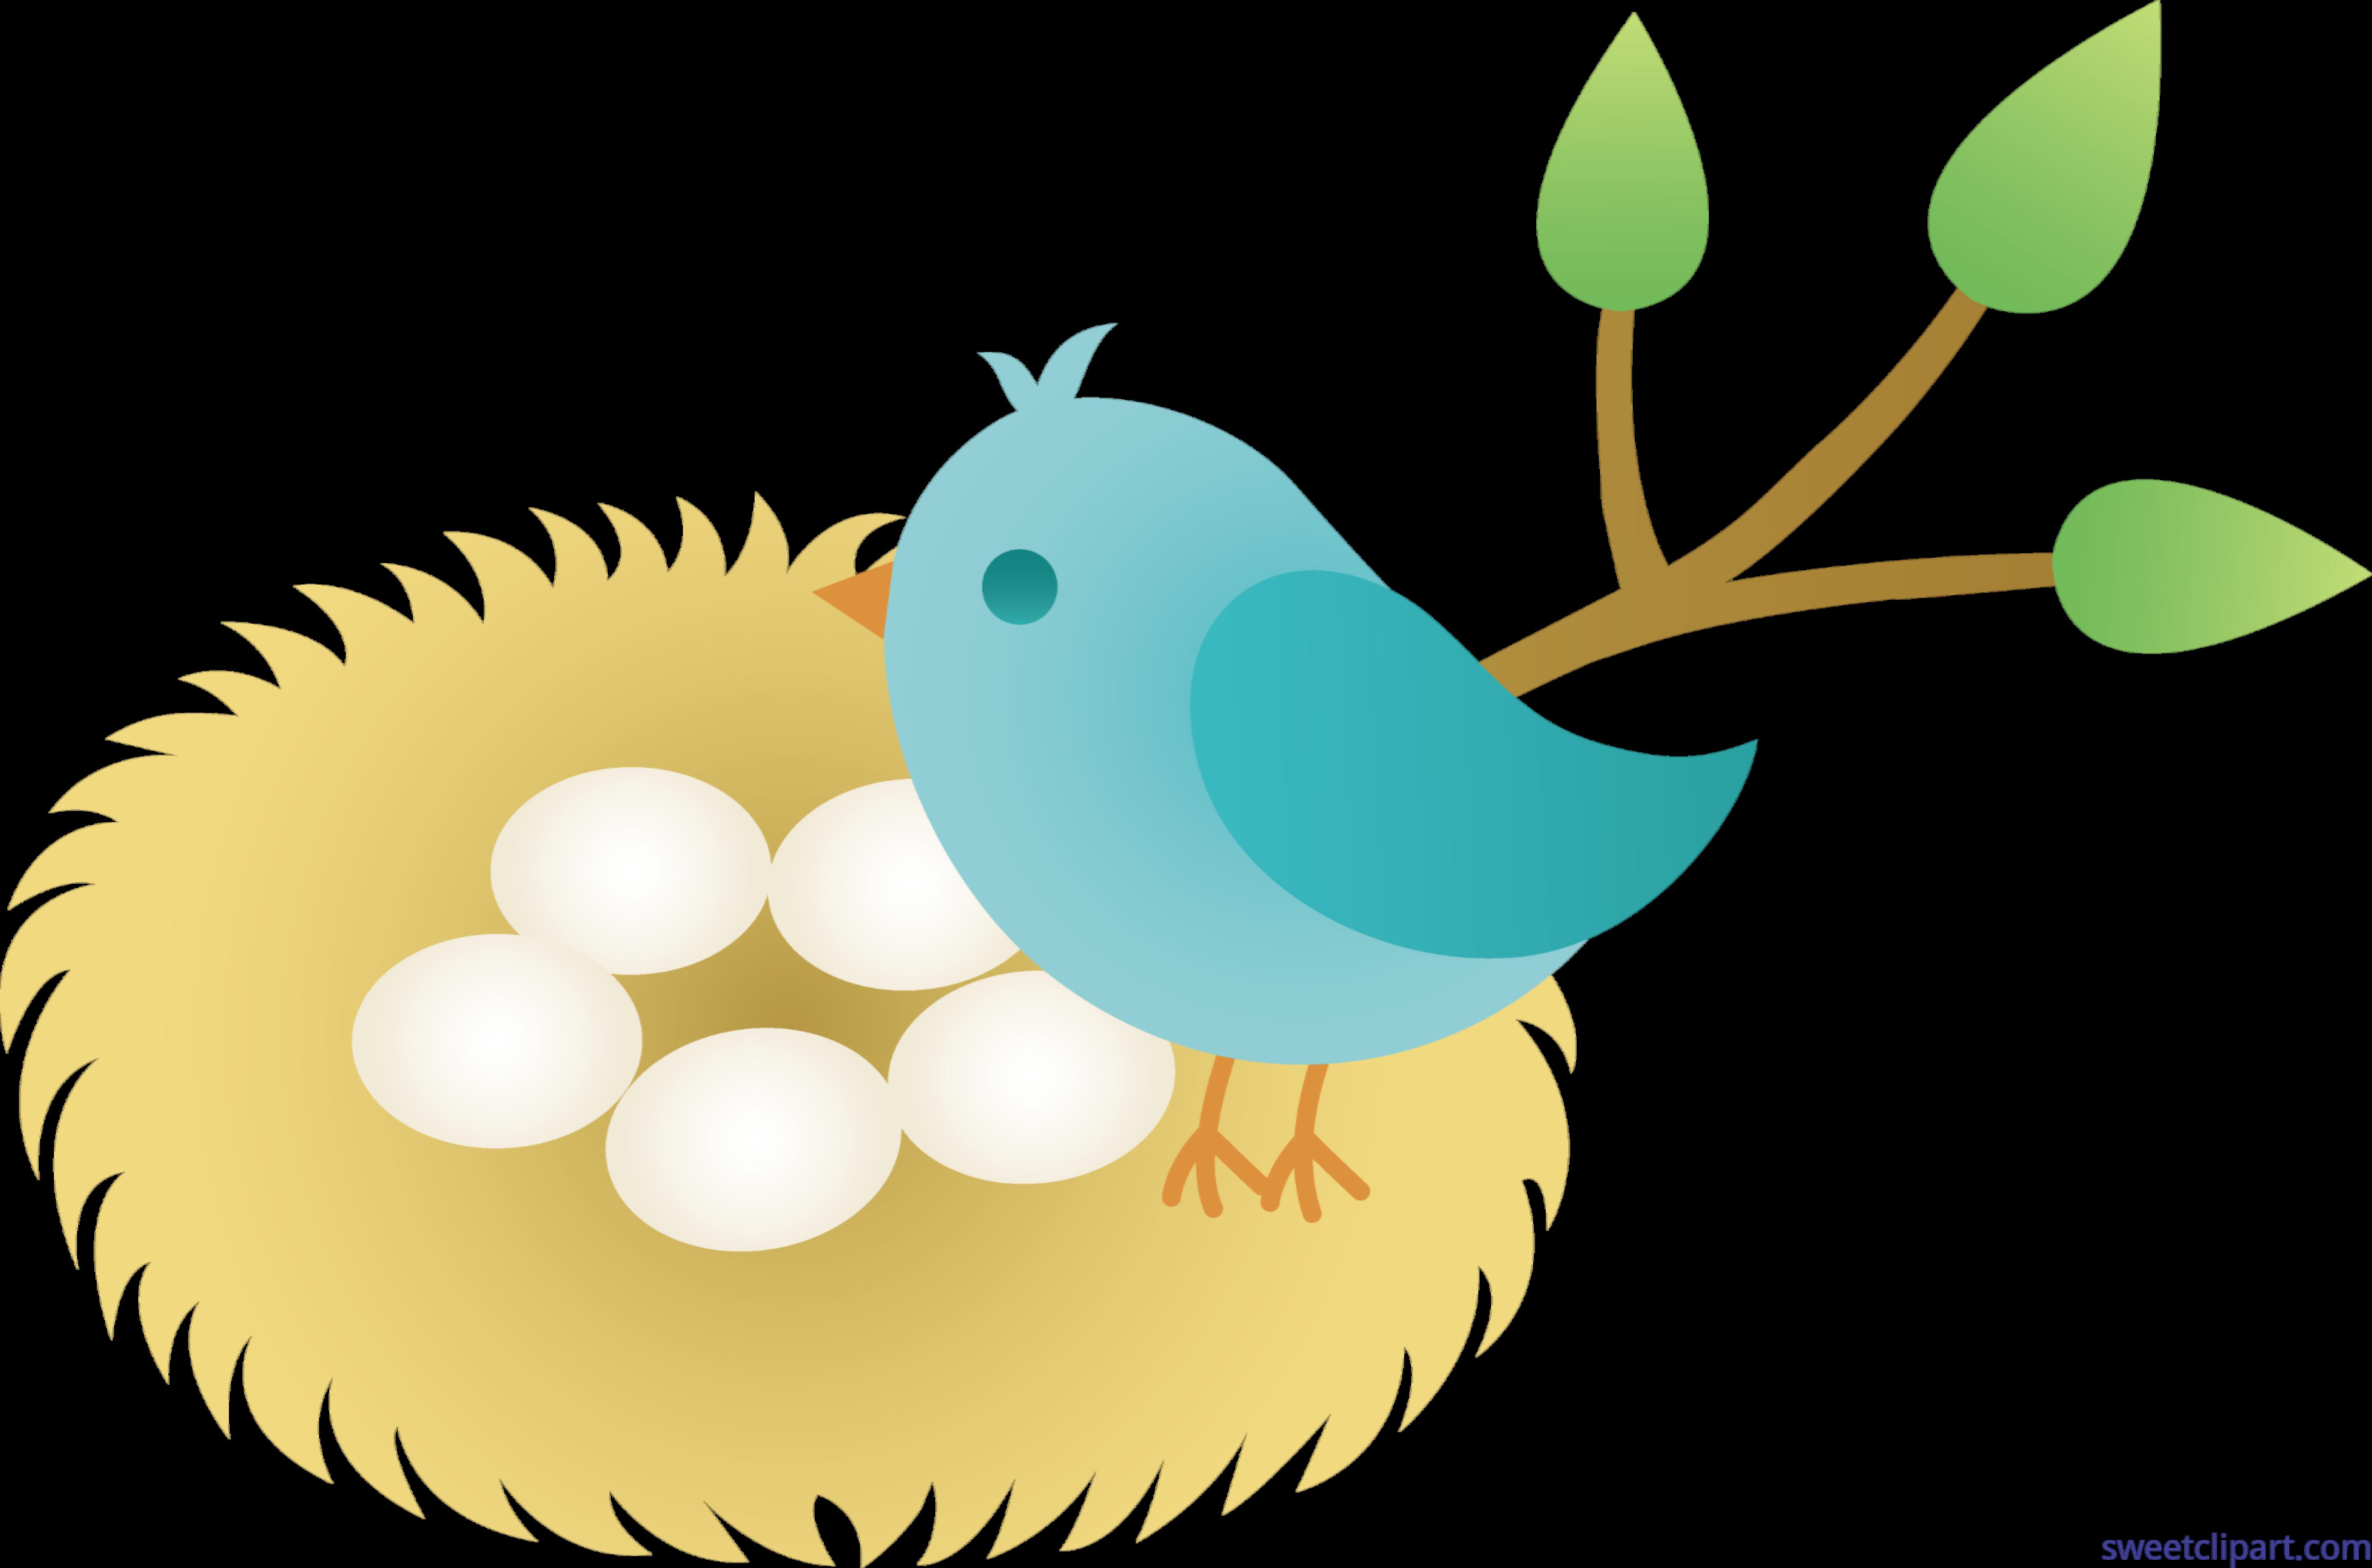 Bird nest in tree clipart vector library stock Unconditional Bird Nest Cartoon With Eggs Clip Art Sweet #14159 vector library stock